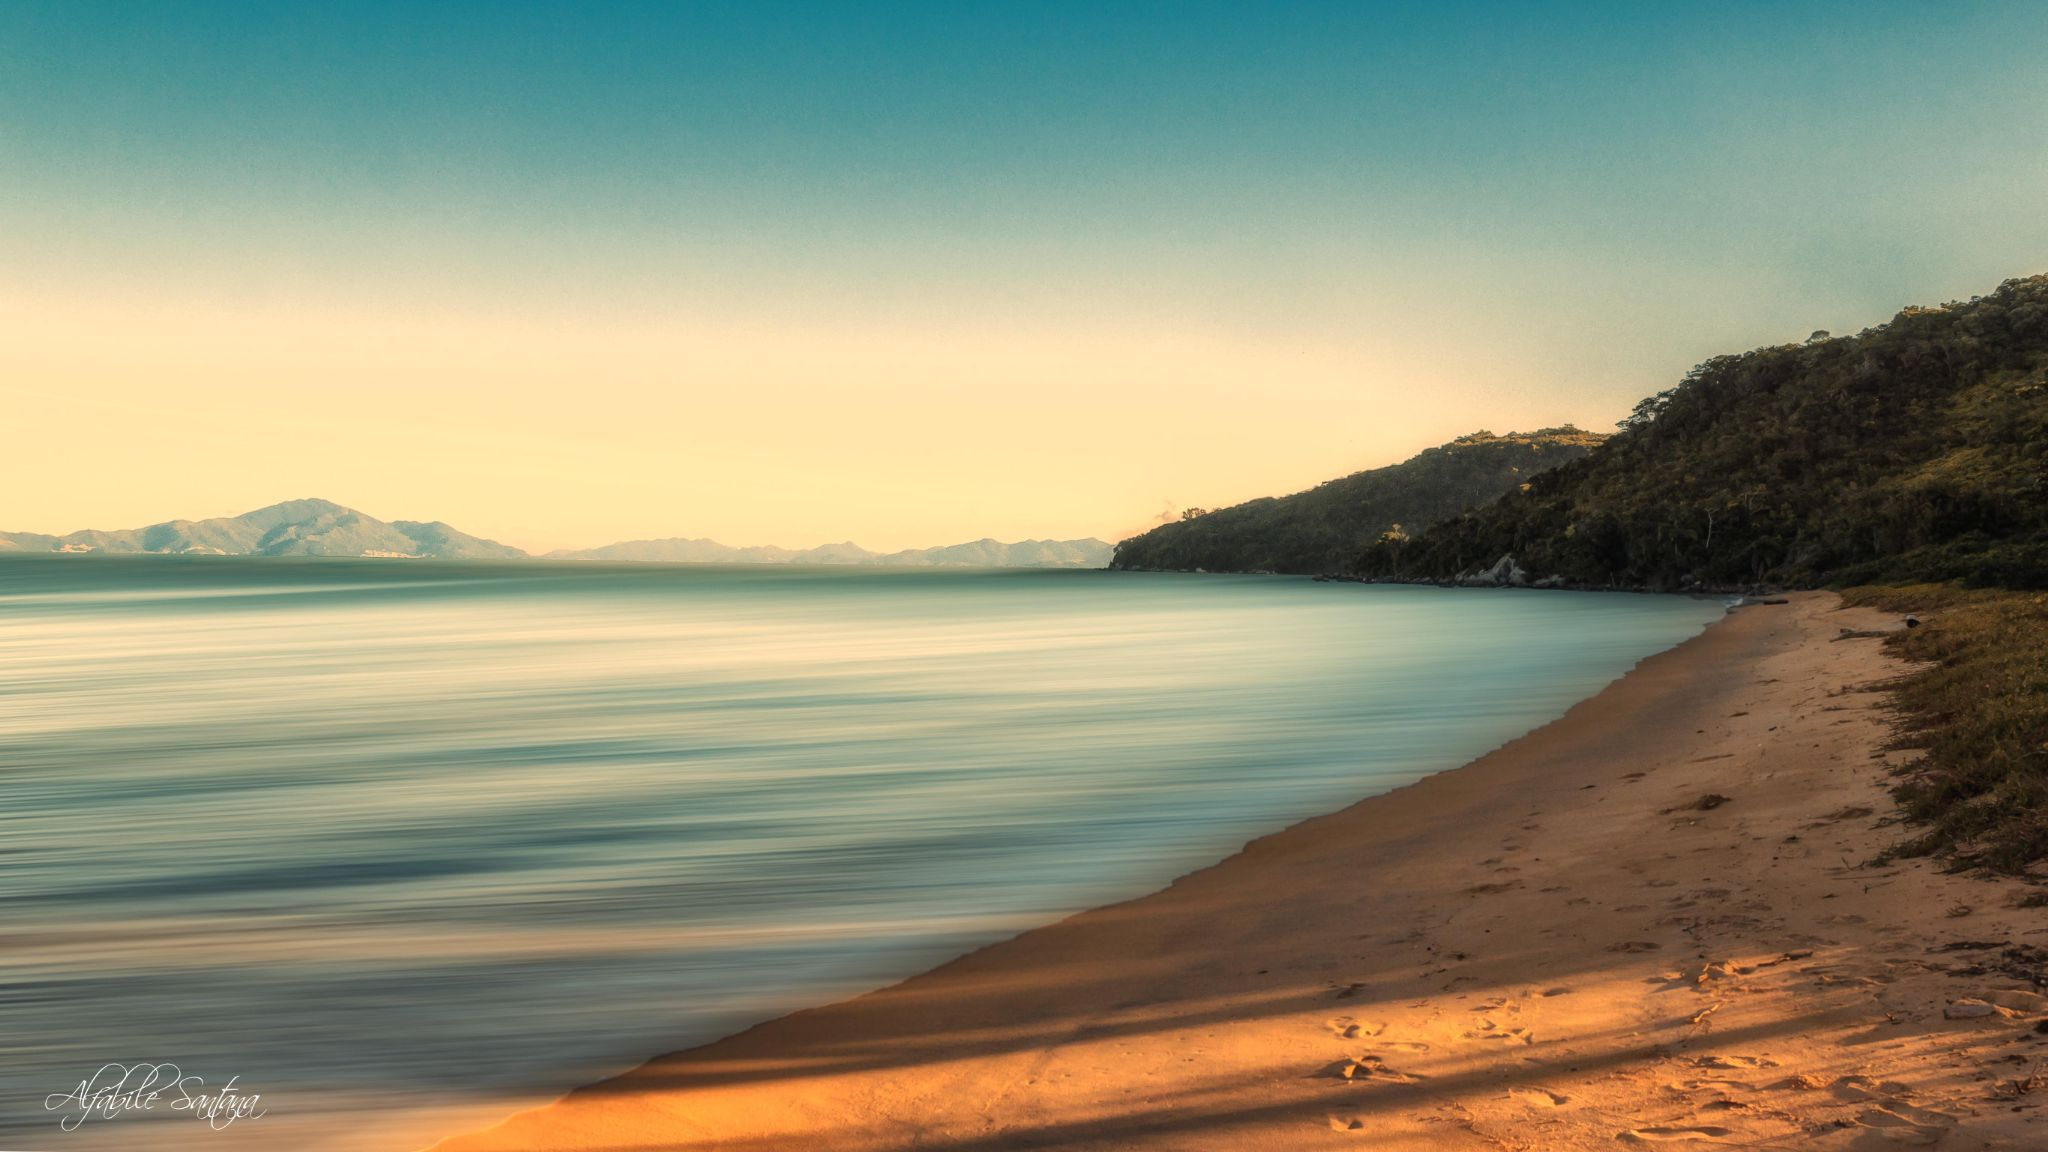 deserted - Cardoso Beach - Bombinhas - Santa Catarina - Brazil by Alfabile